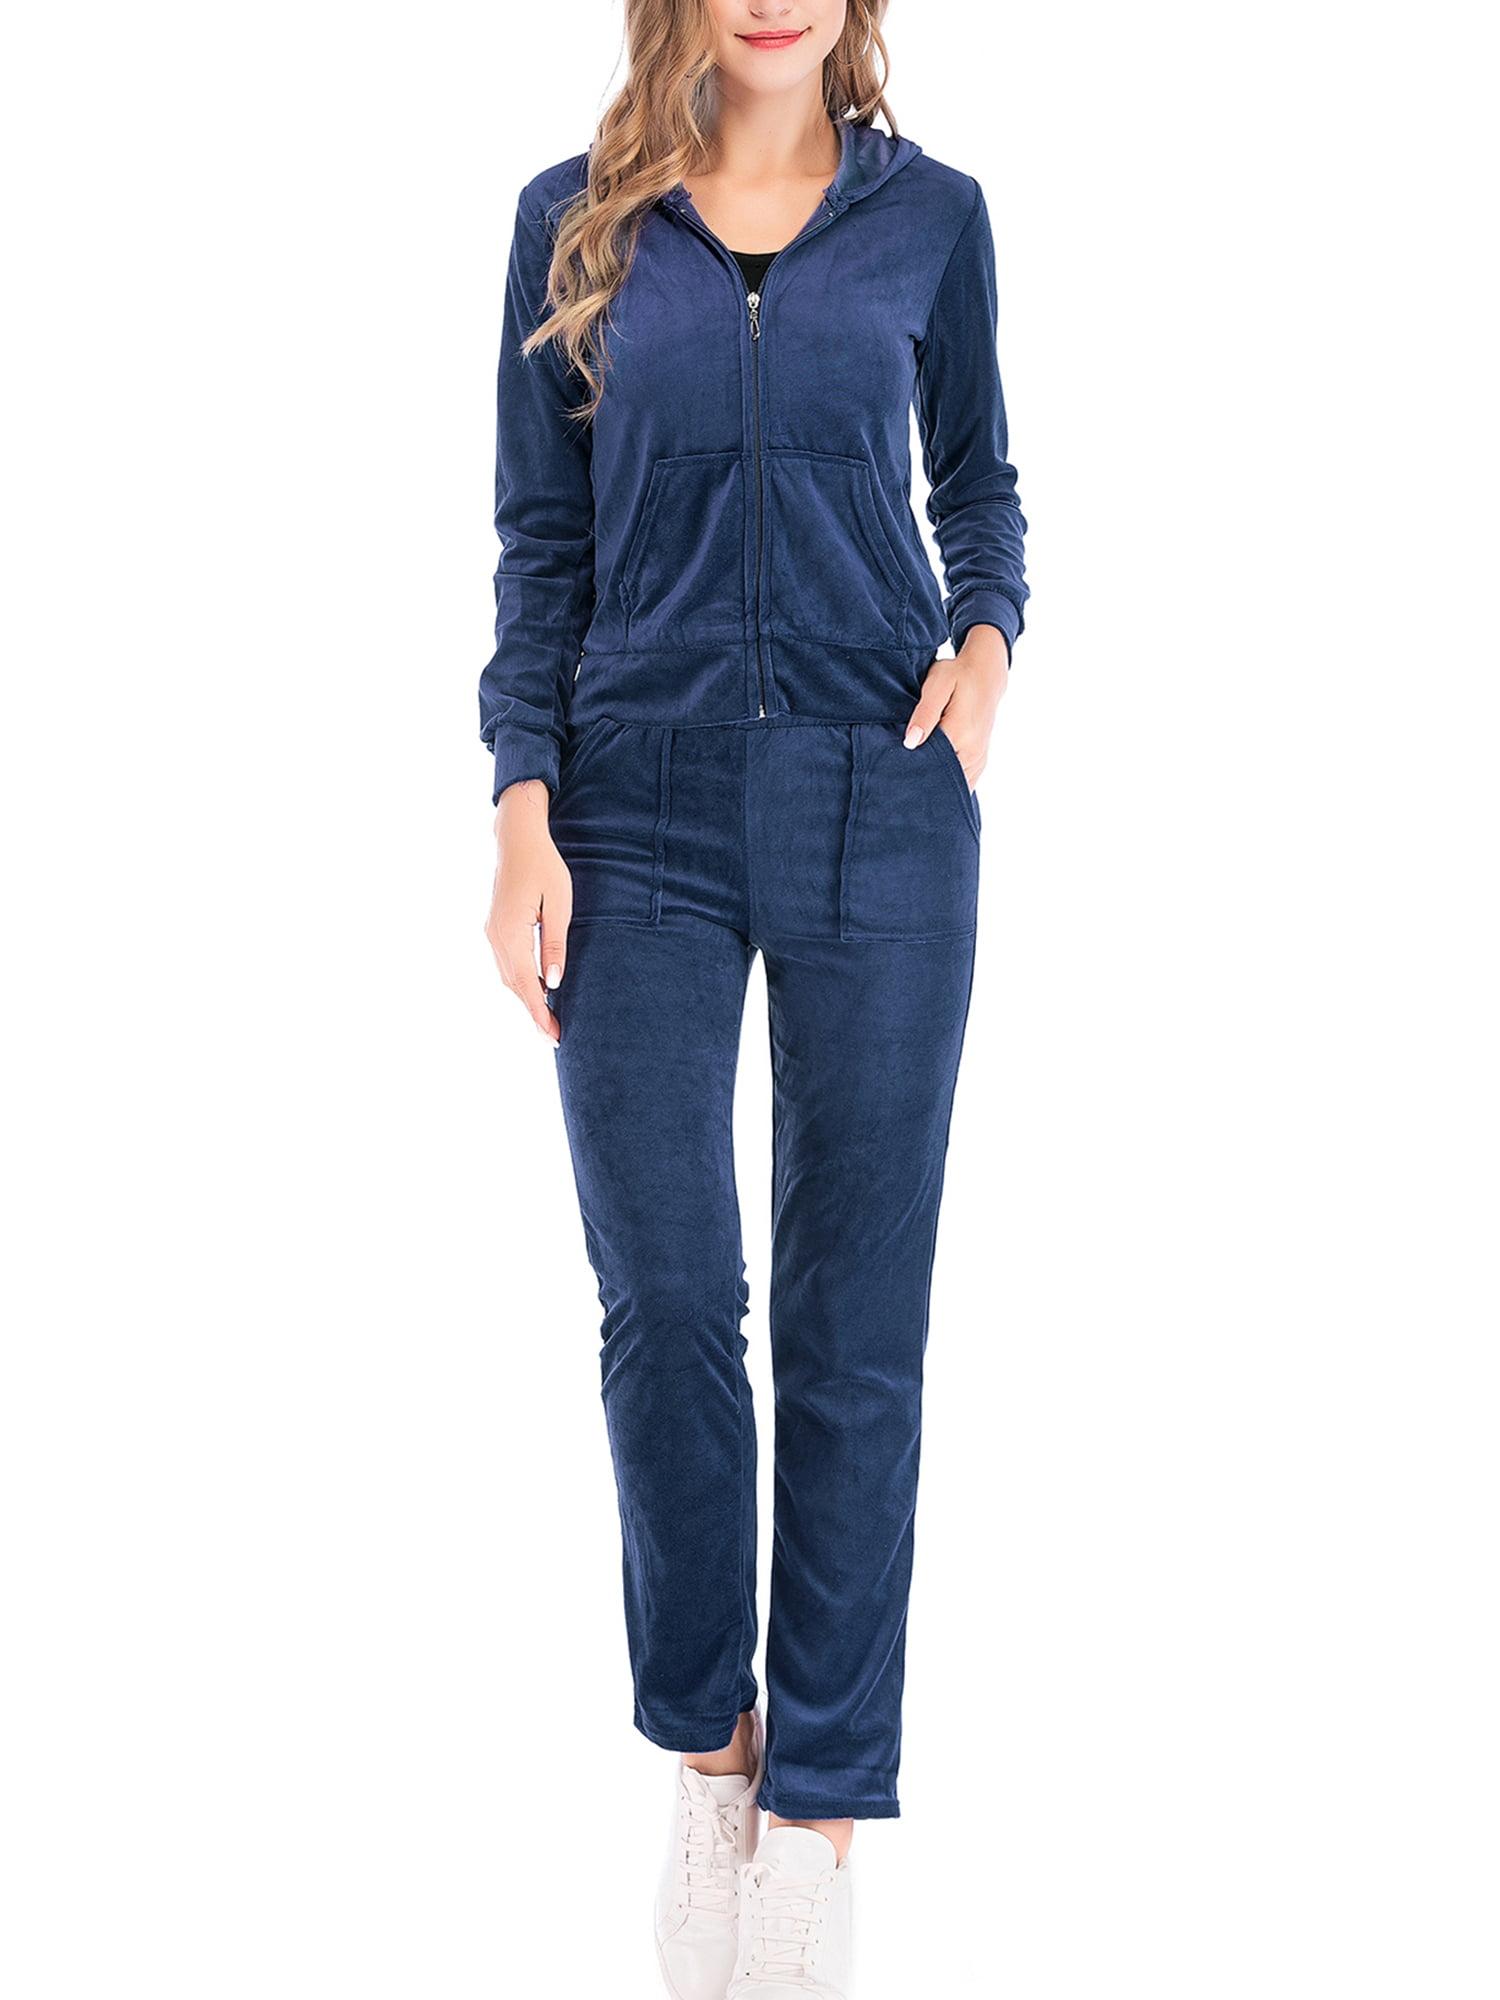 Womens Ladies Velvet Tracksuit Set 2 Piece Sweatshirt//Joggers Loungewear Suit